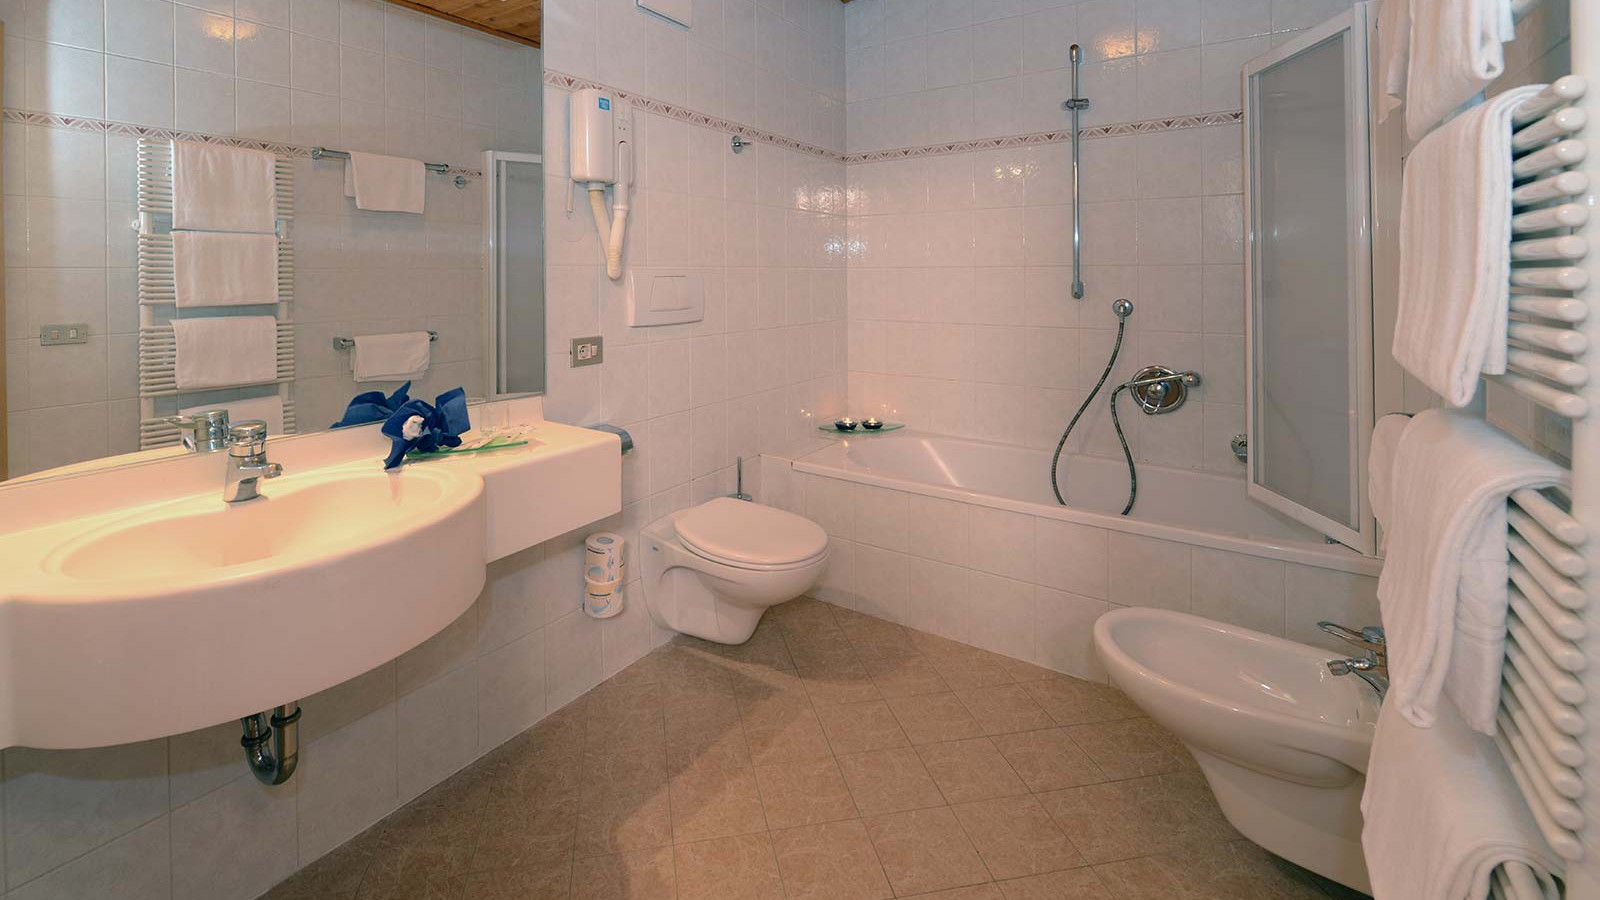 Hotel Alpin Haus, Selva Val Gardena - Bathroom - Comfort Room